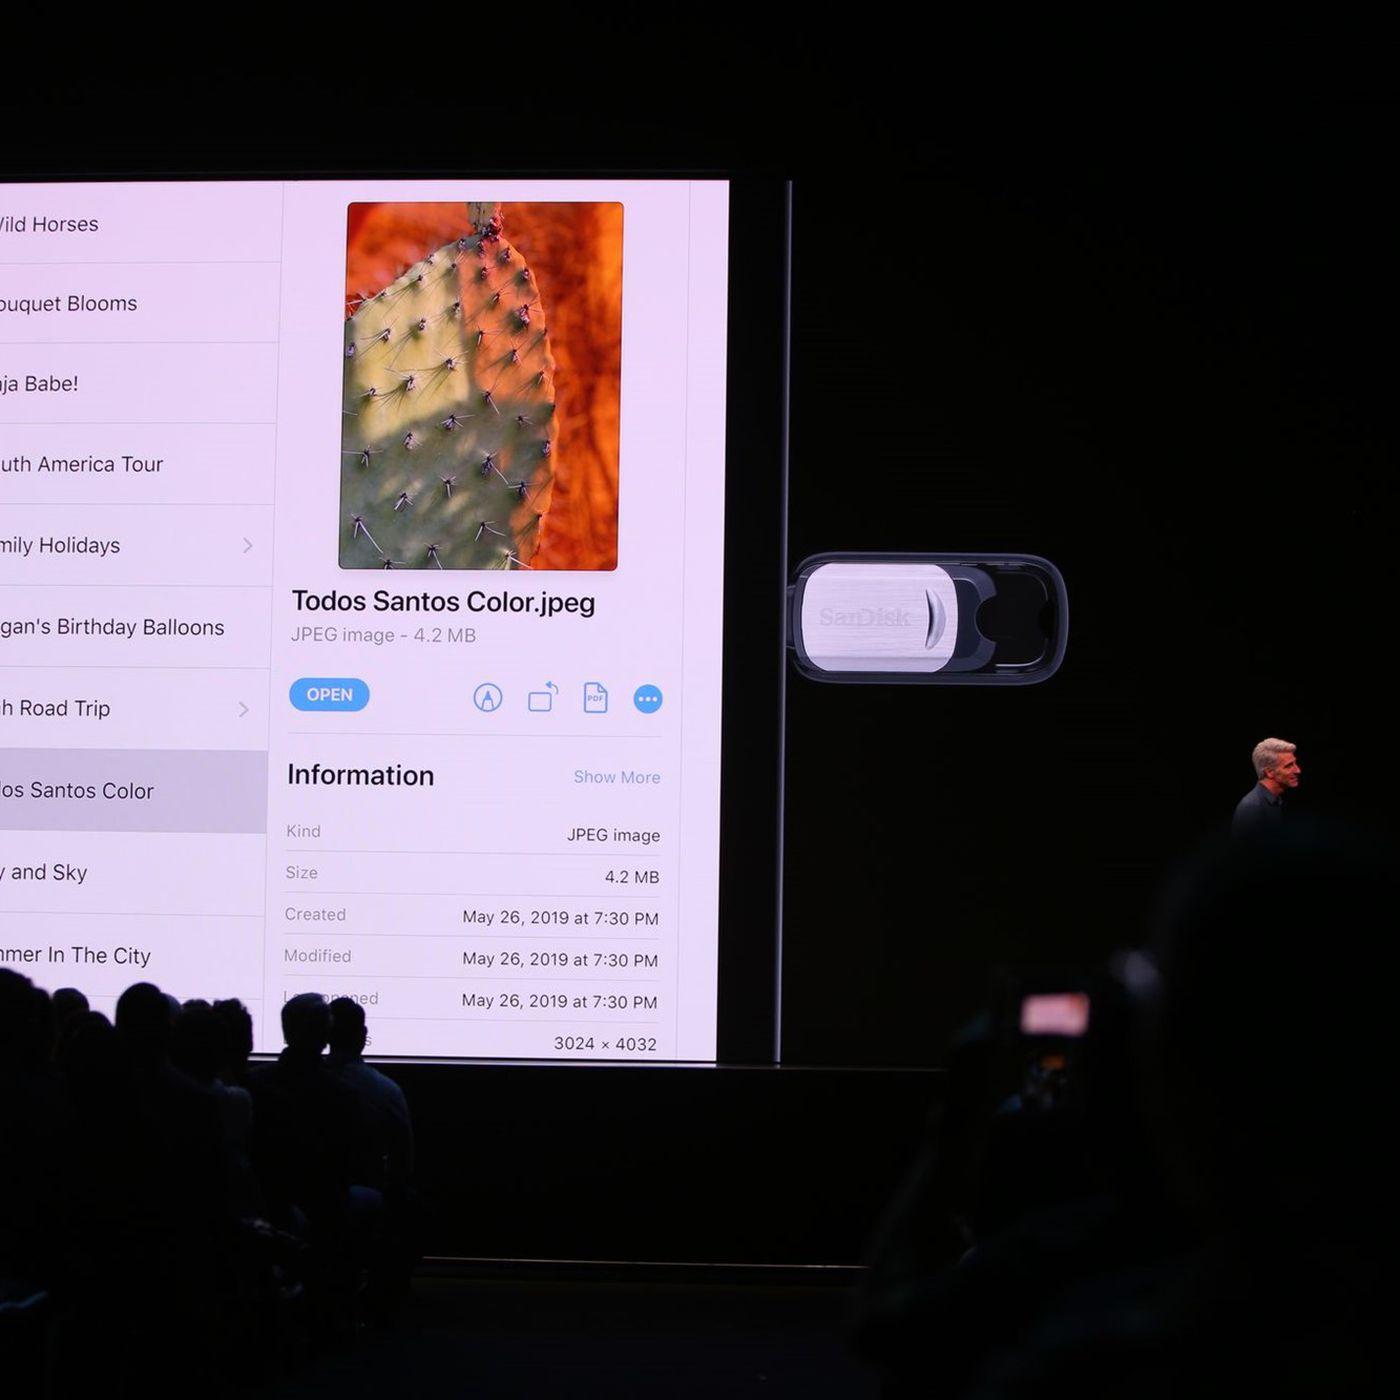 SanDisk 128GB iXpand Flash Drive Go - Apple